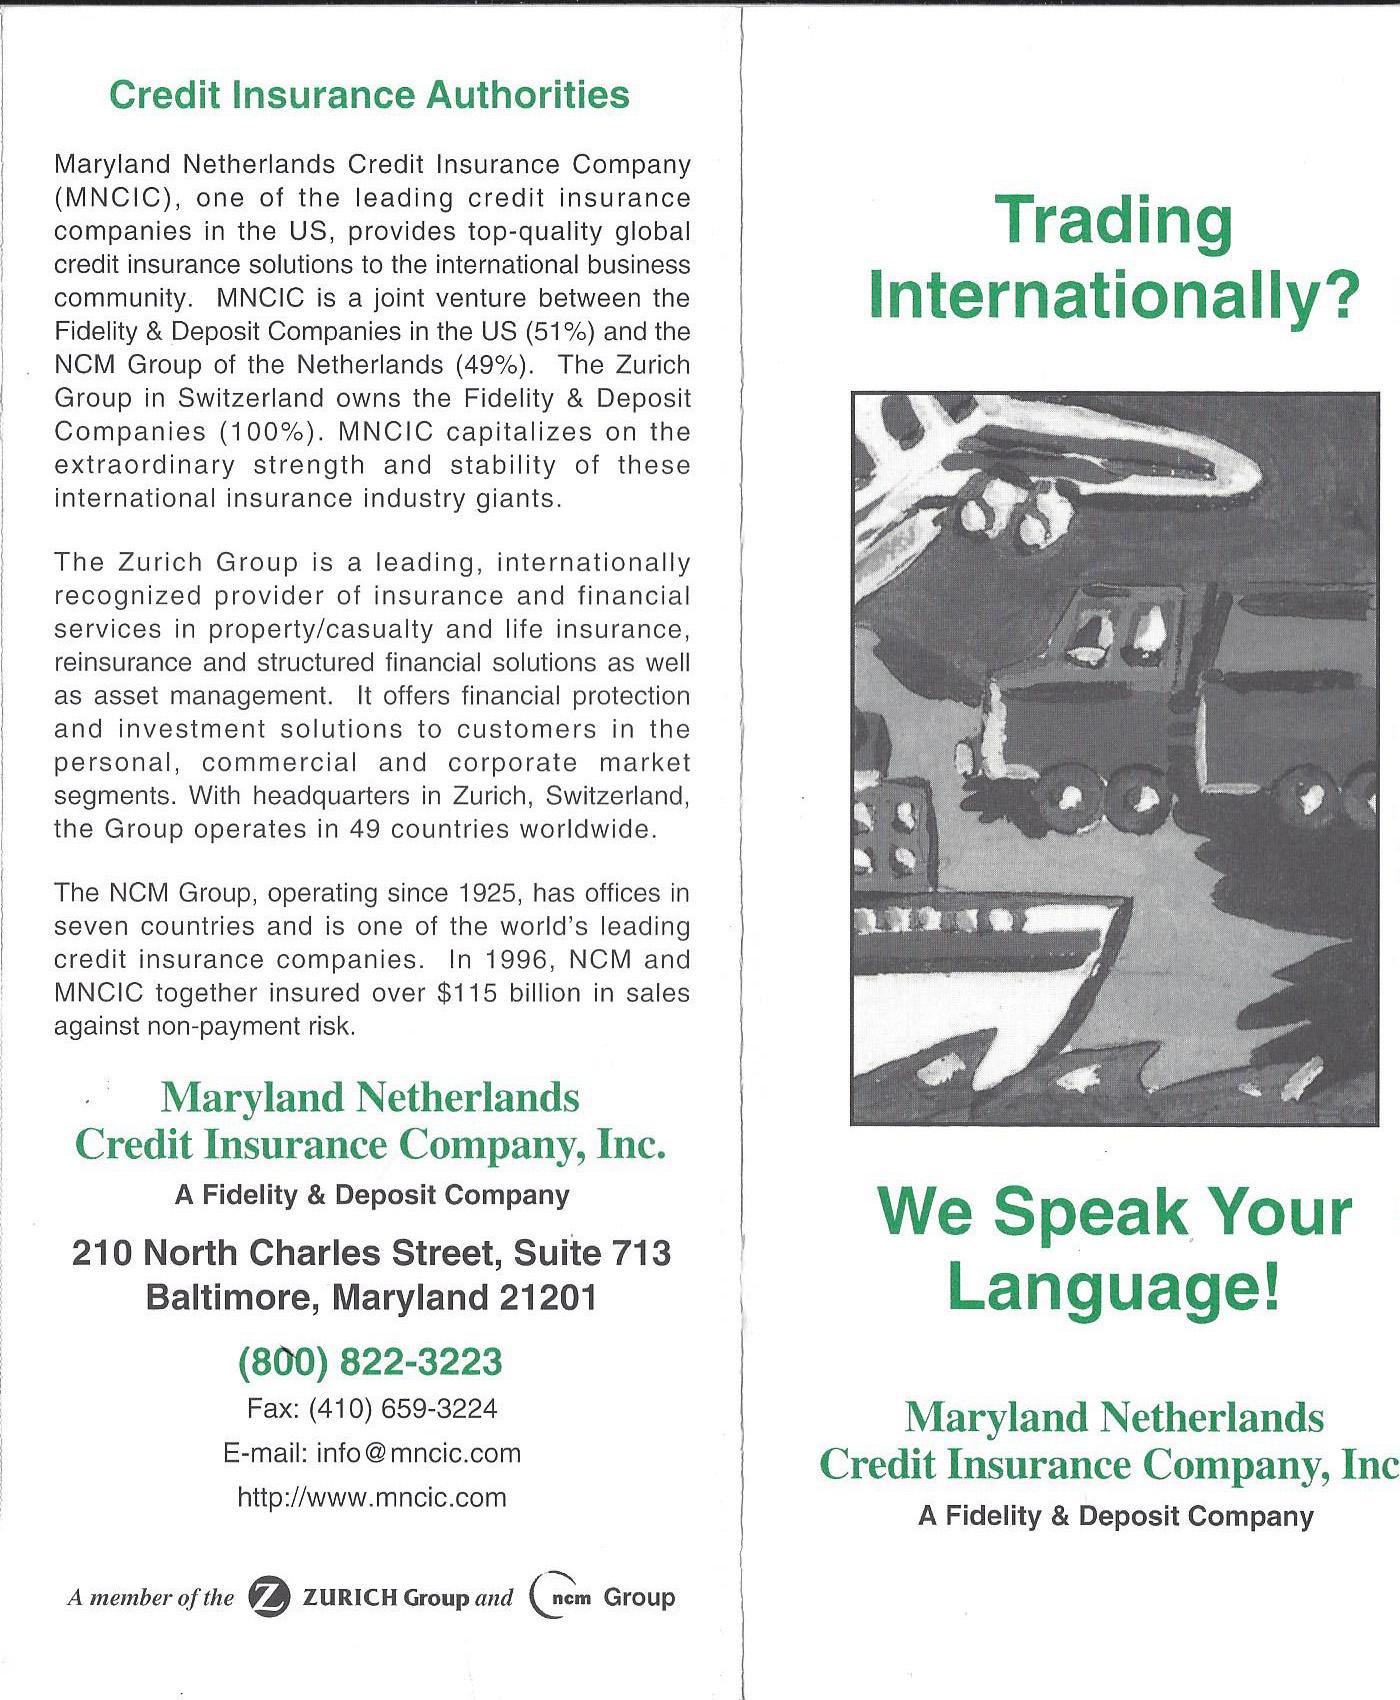 Trading Internationally – Maryland Netherlands Credit